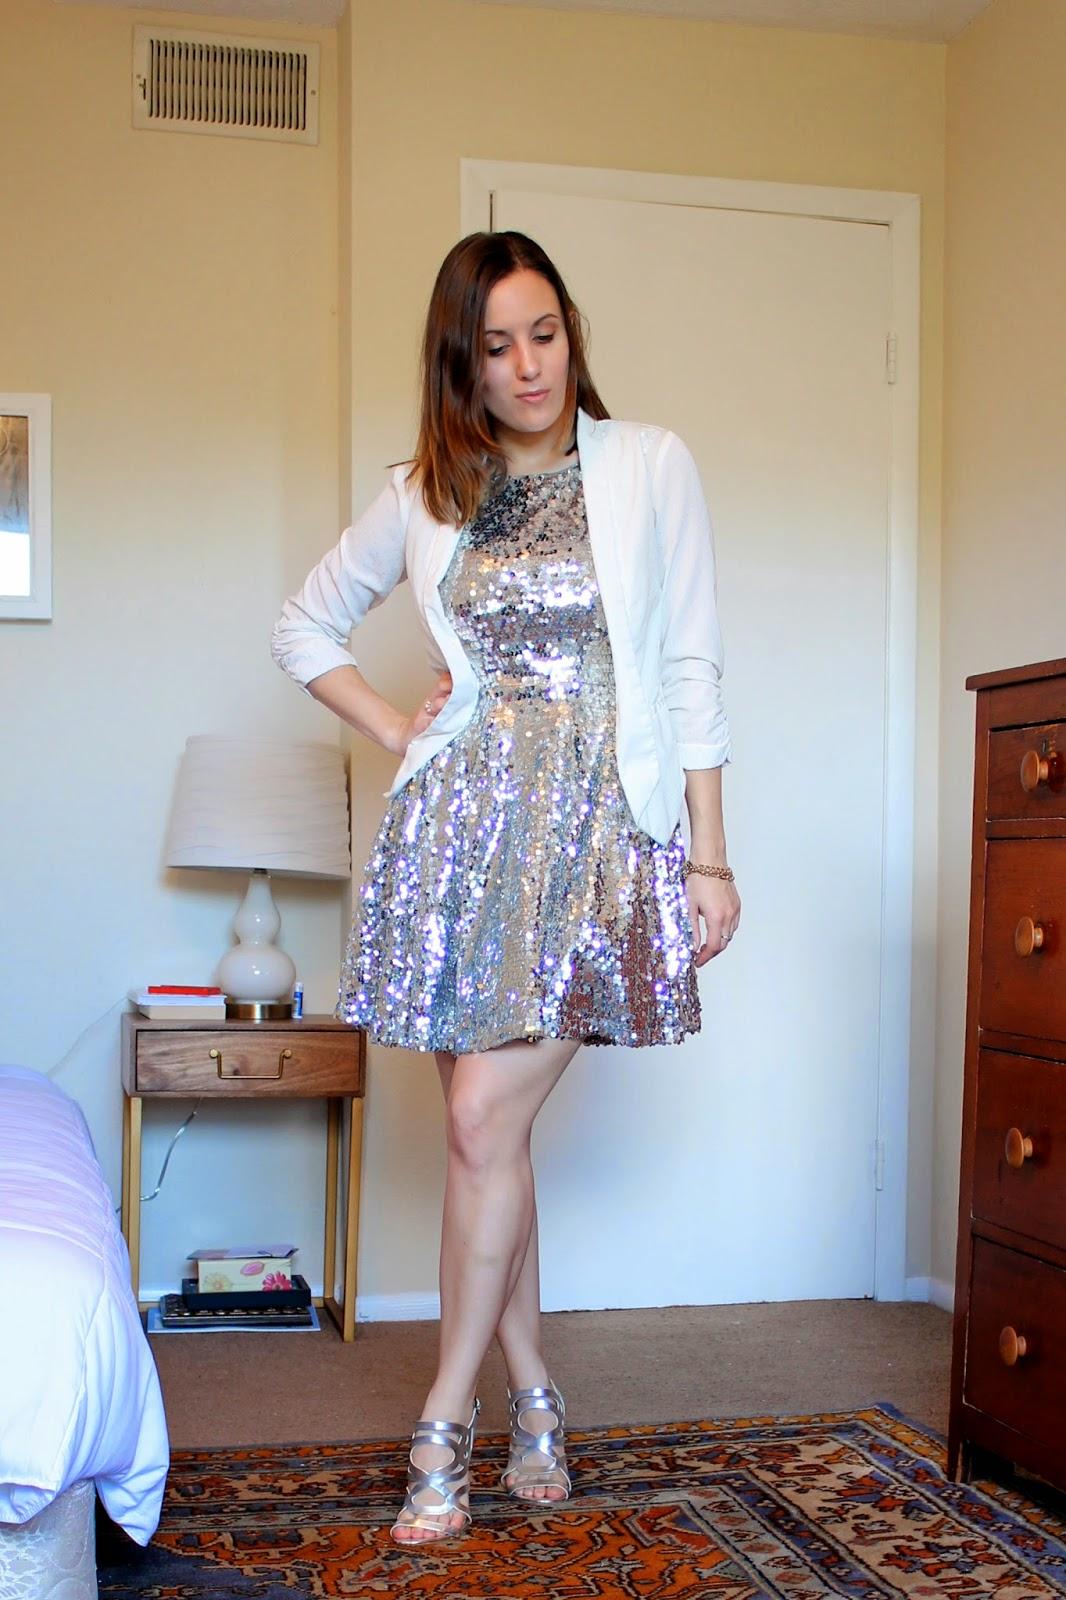 Nordstrom, BCBG Paris, style blog, fashion blog, NYE style, holiday outfits, holiday fashion, winter style, winter wardrobe